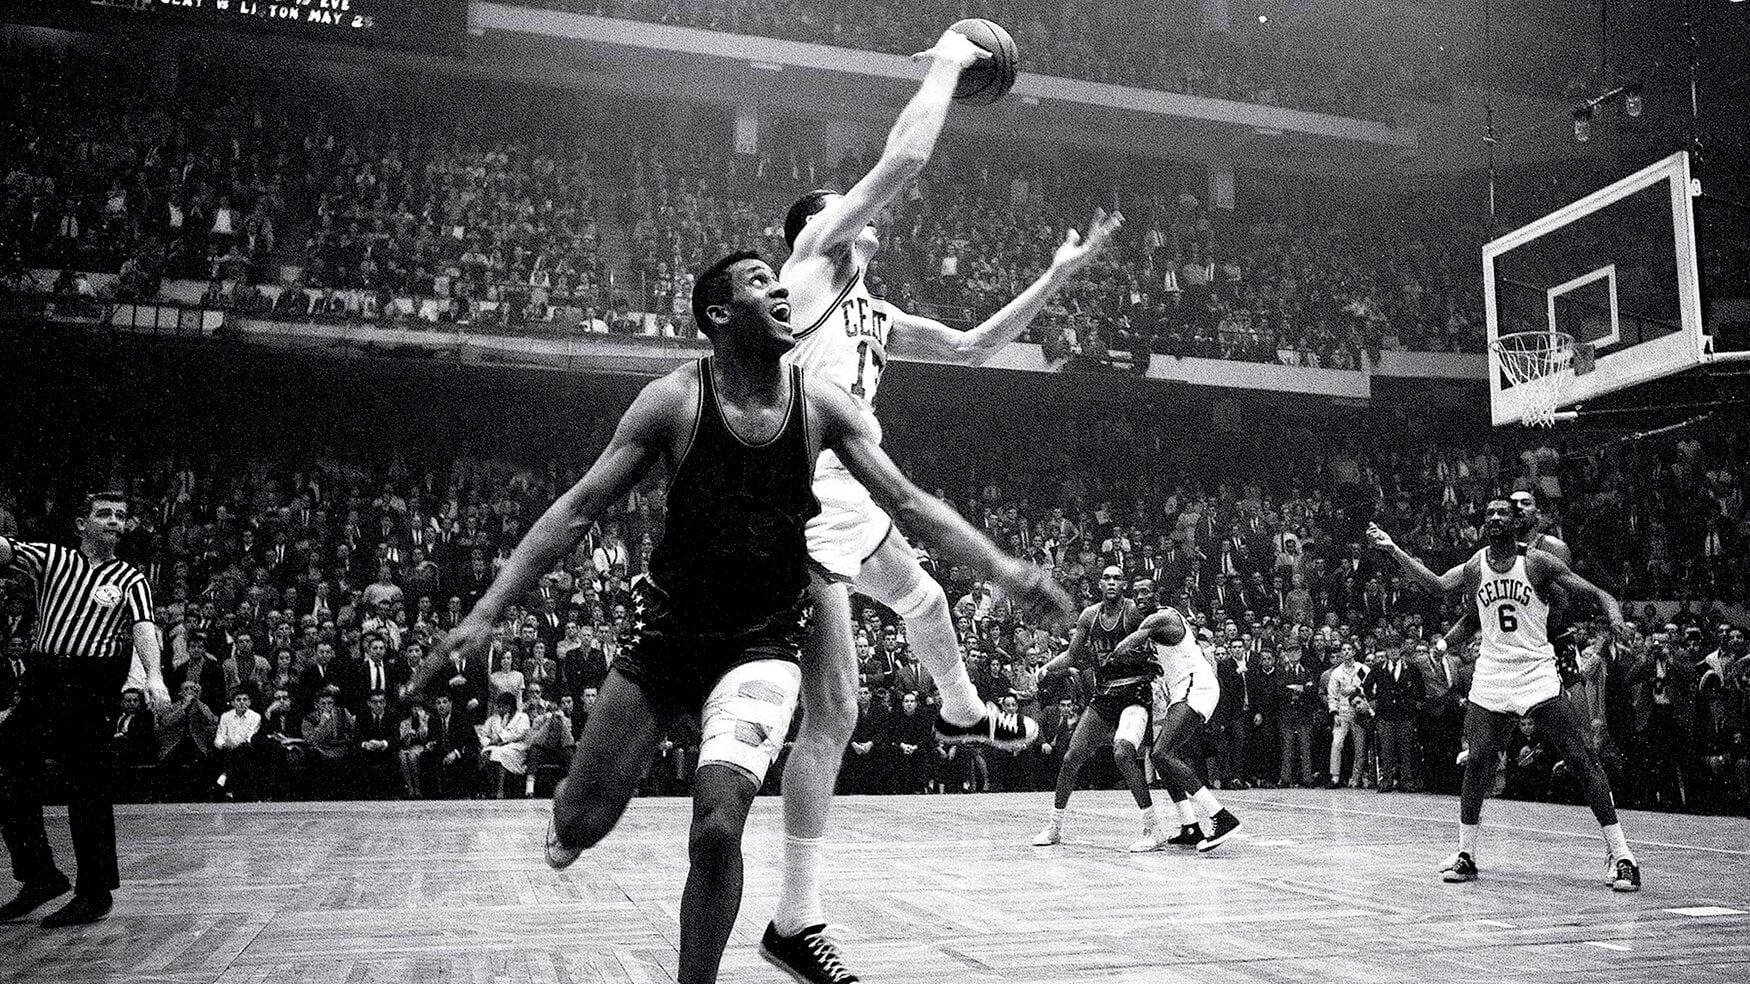 Top Moments: John Havlicek's steal seals Celtics' Game 7 win in 1965